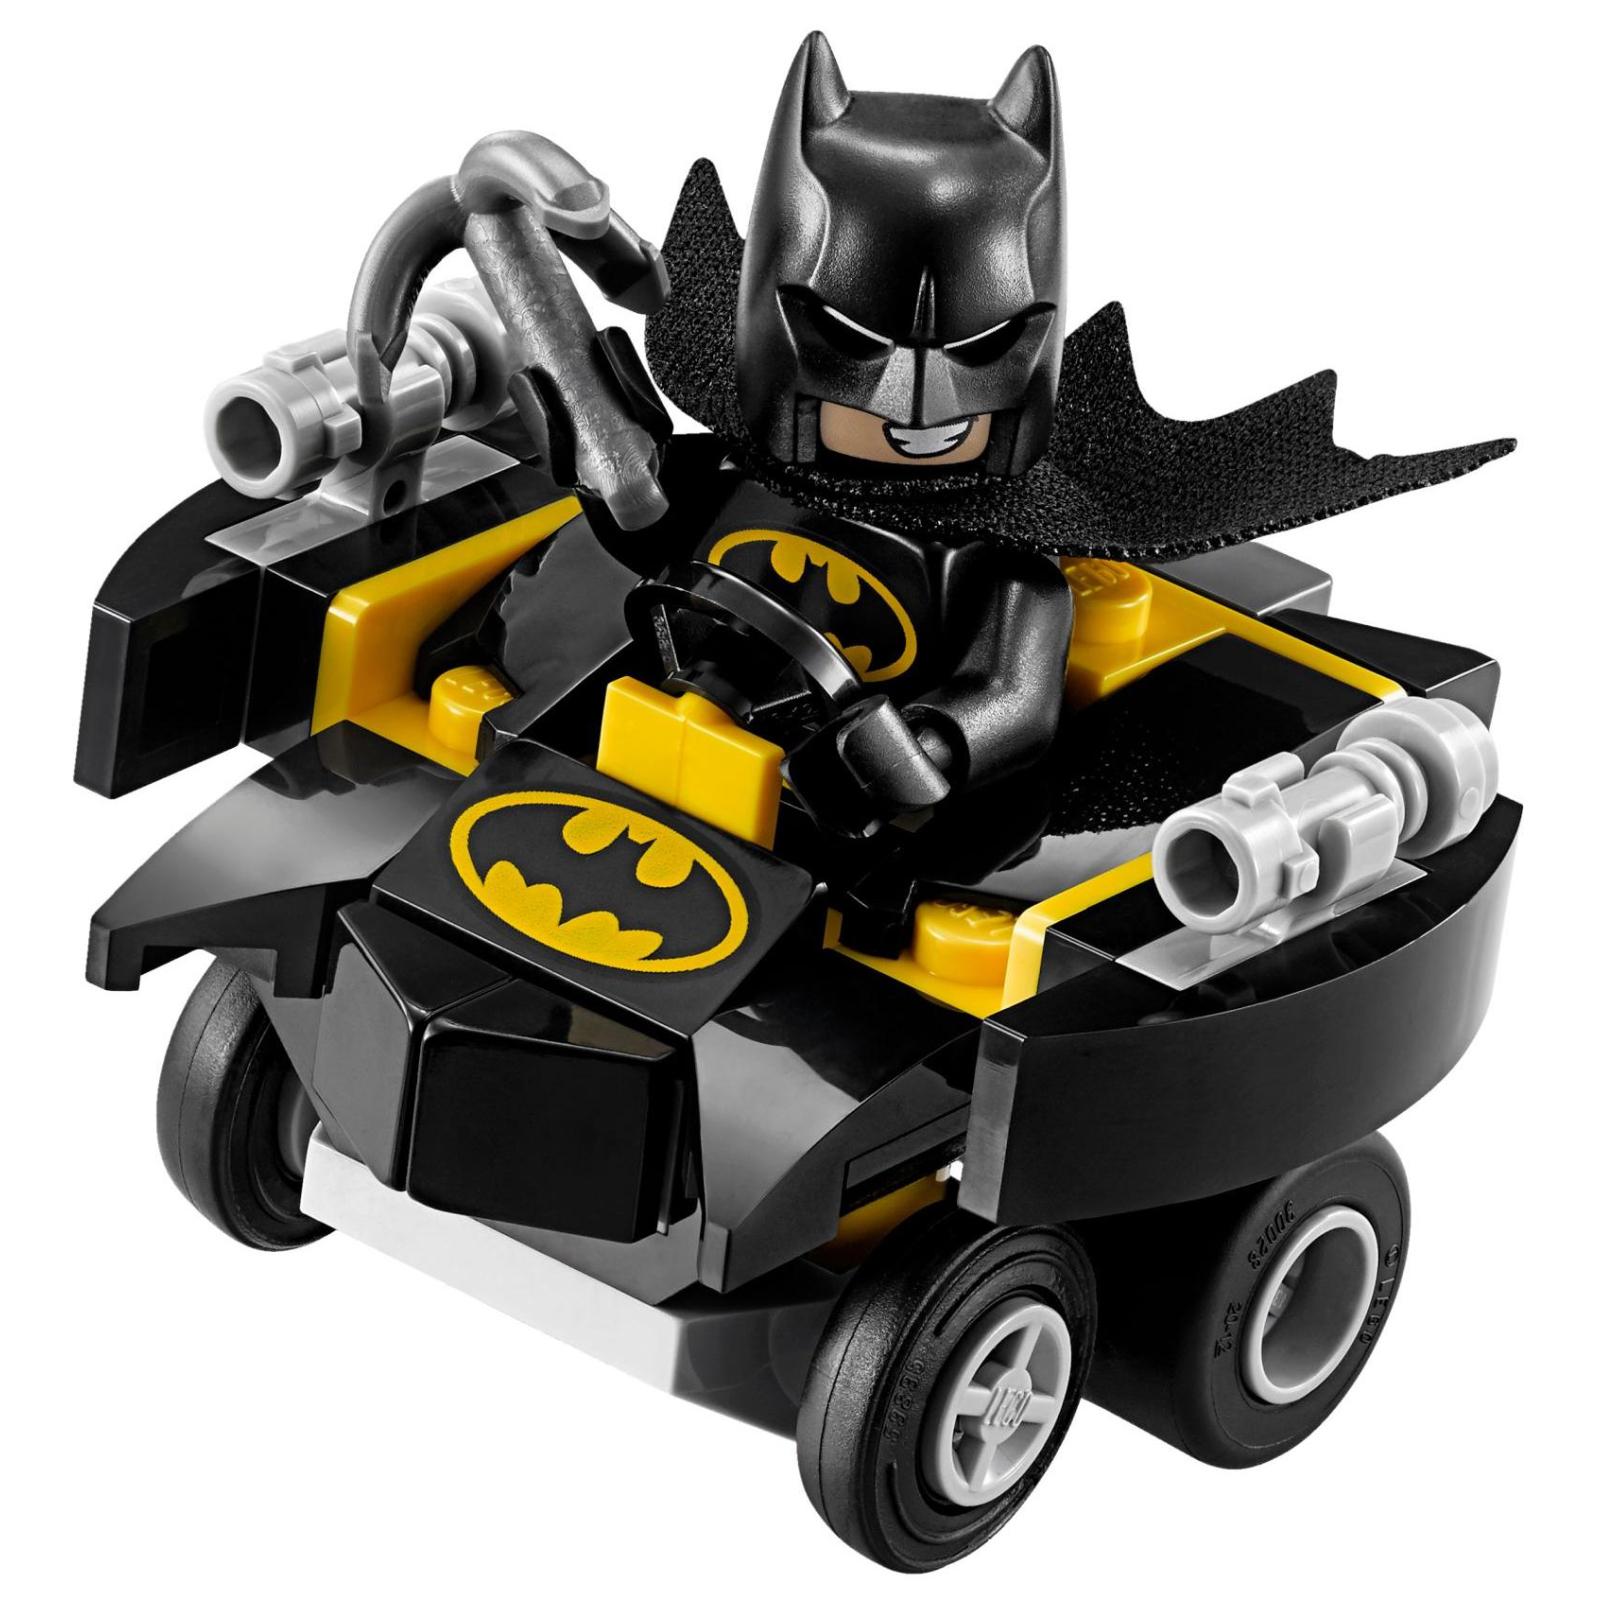 Конструктор LEGO Super Heroes Mighty Micros: Бэтмен против Харли Квин (76092) изображение 3